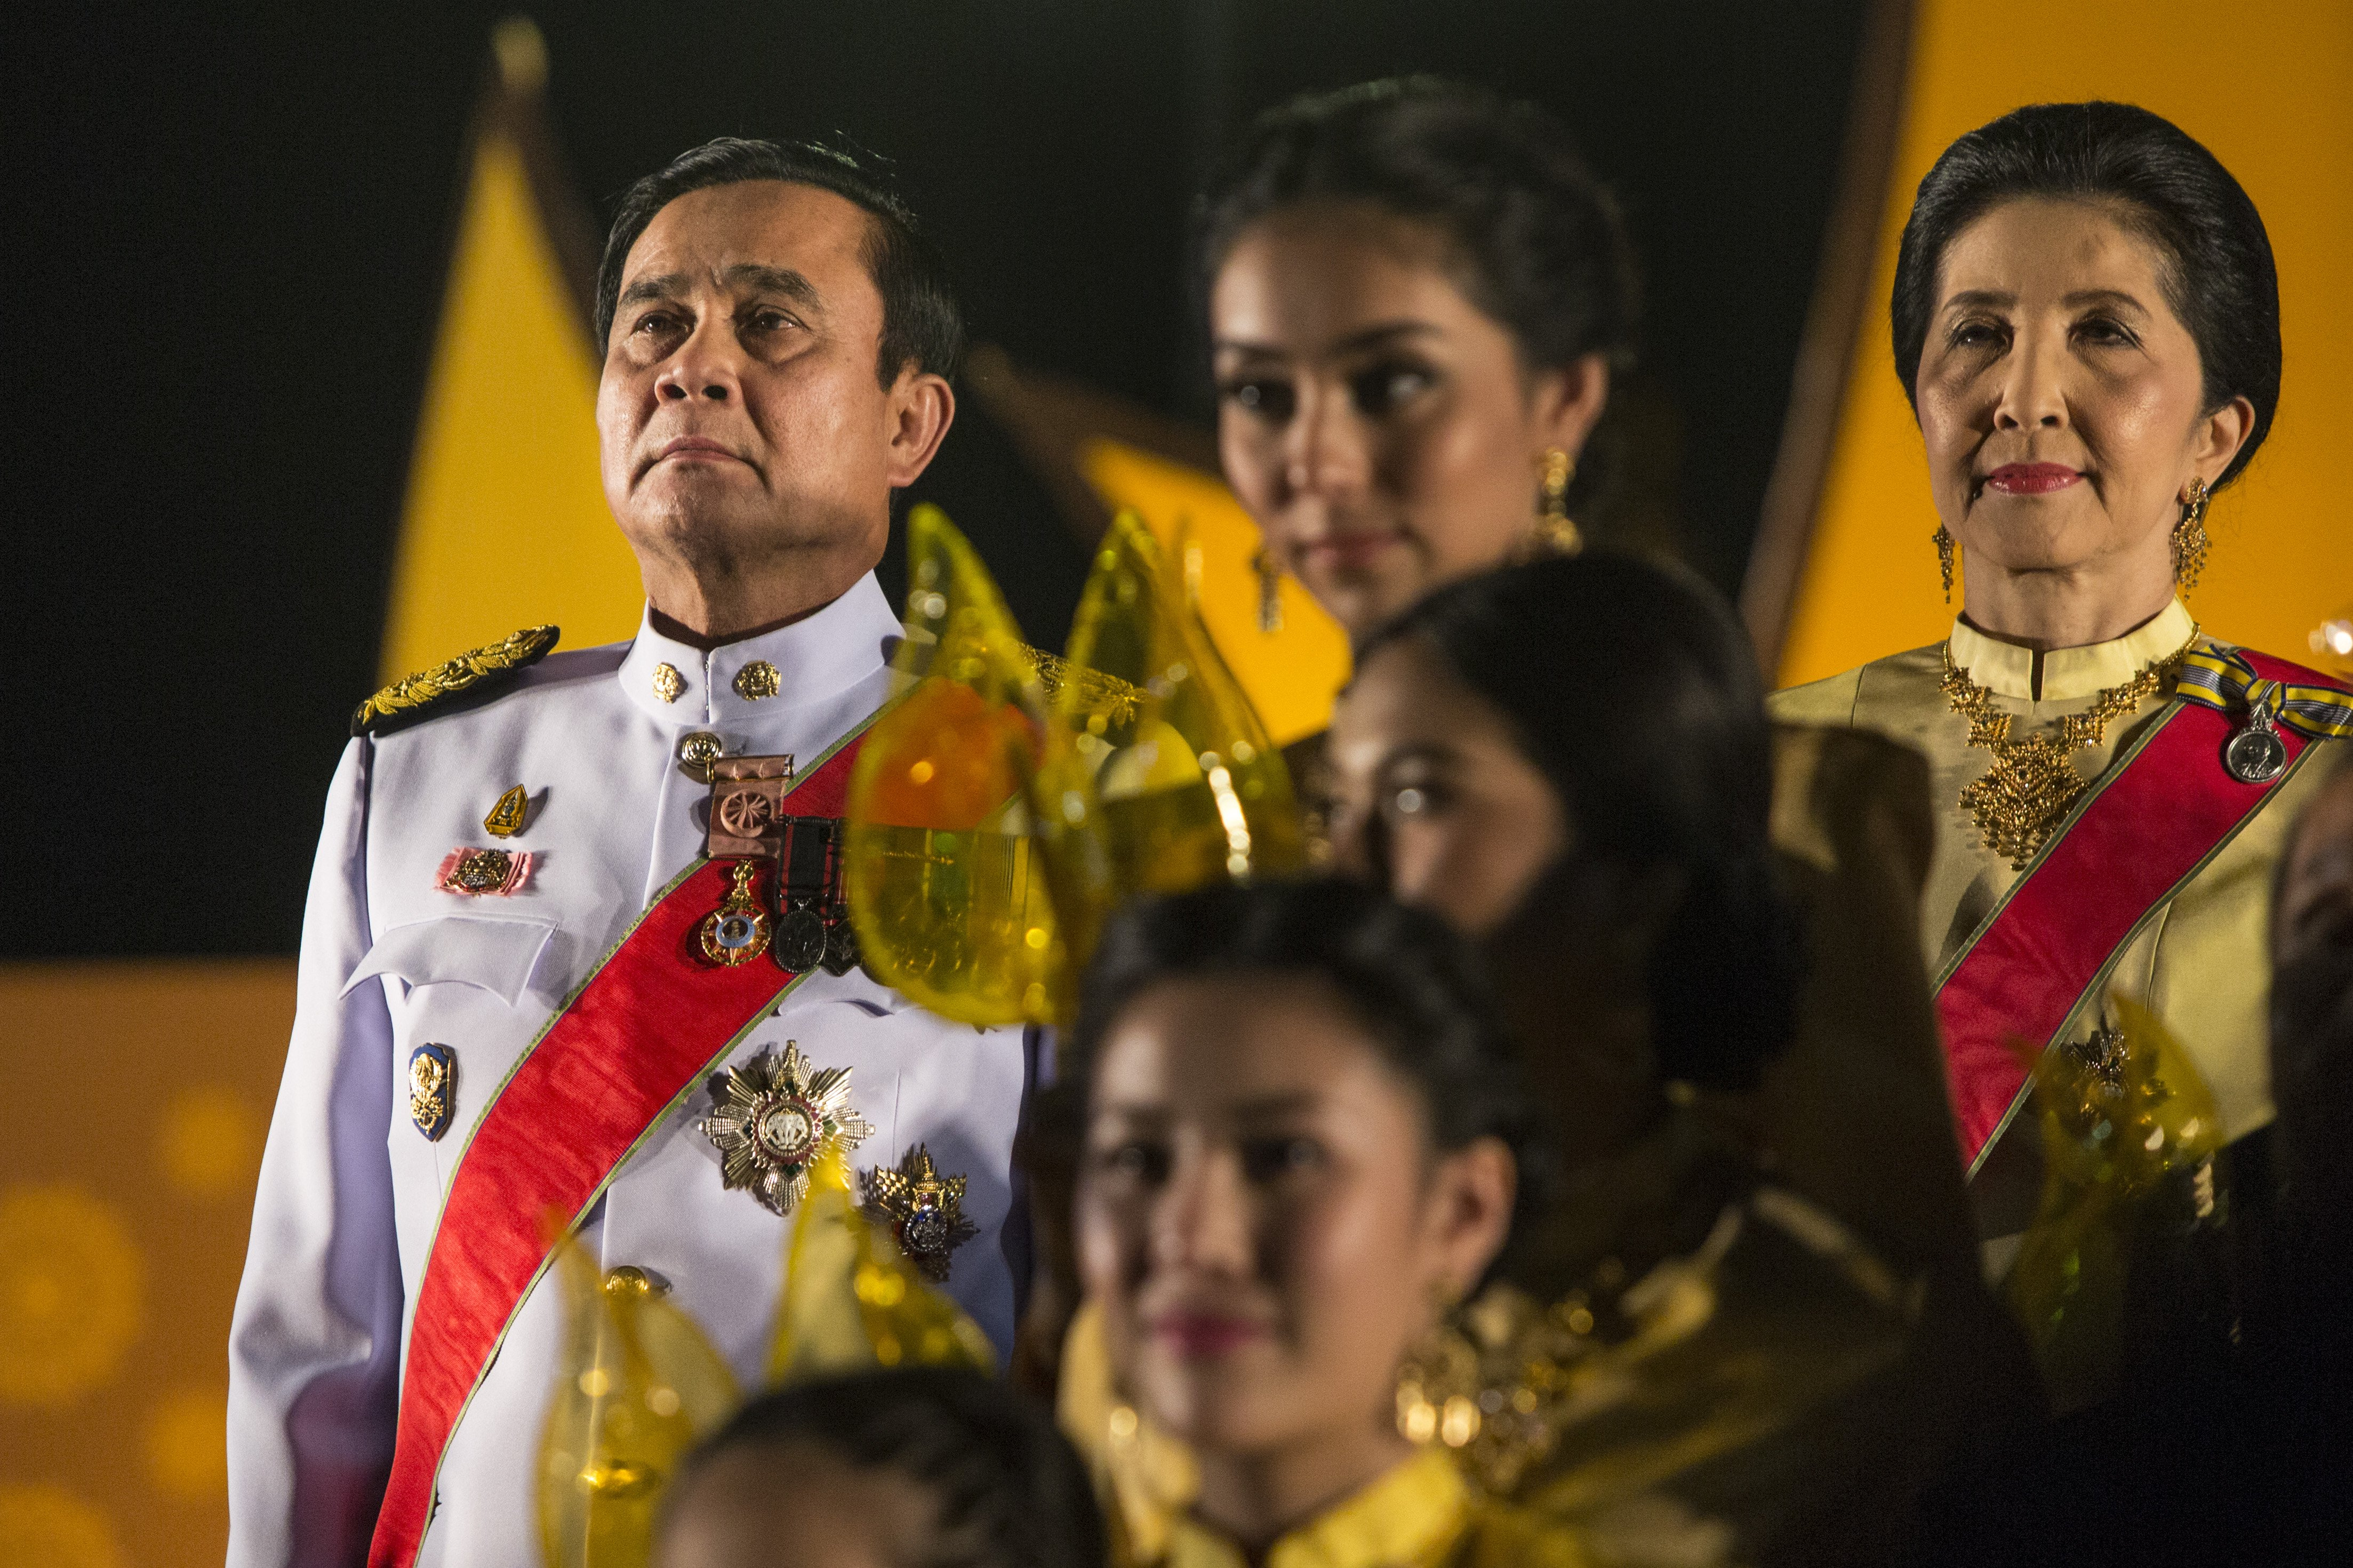 Thai Prime Minister Prayut Chan-o-cha during celebrations for Thailand's King Bhumibol Adulyadej on his 88th birthday in Bangkok, on Dec. 5, 2015.